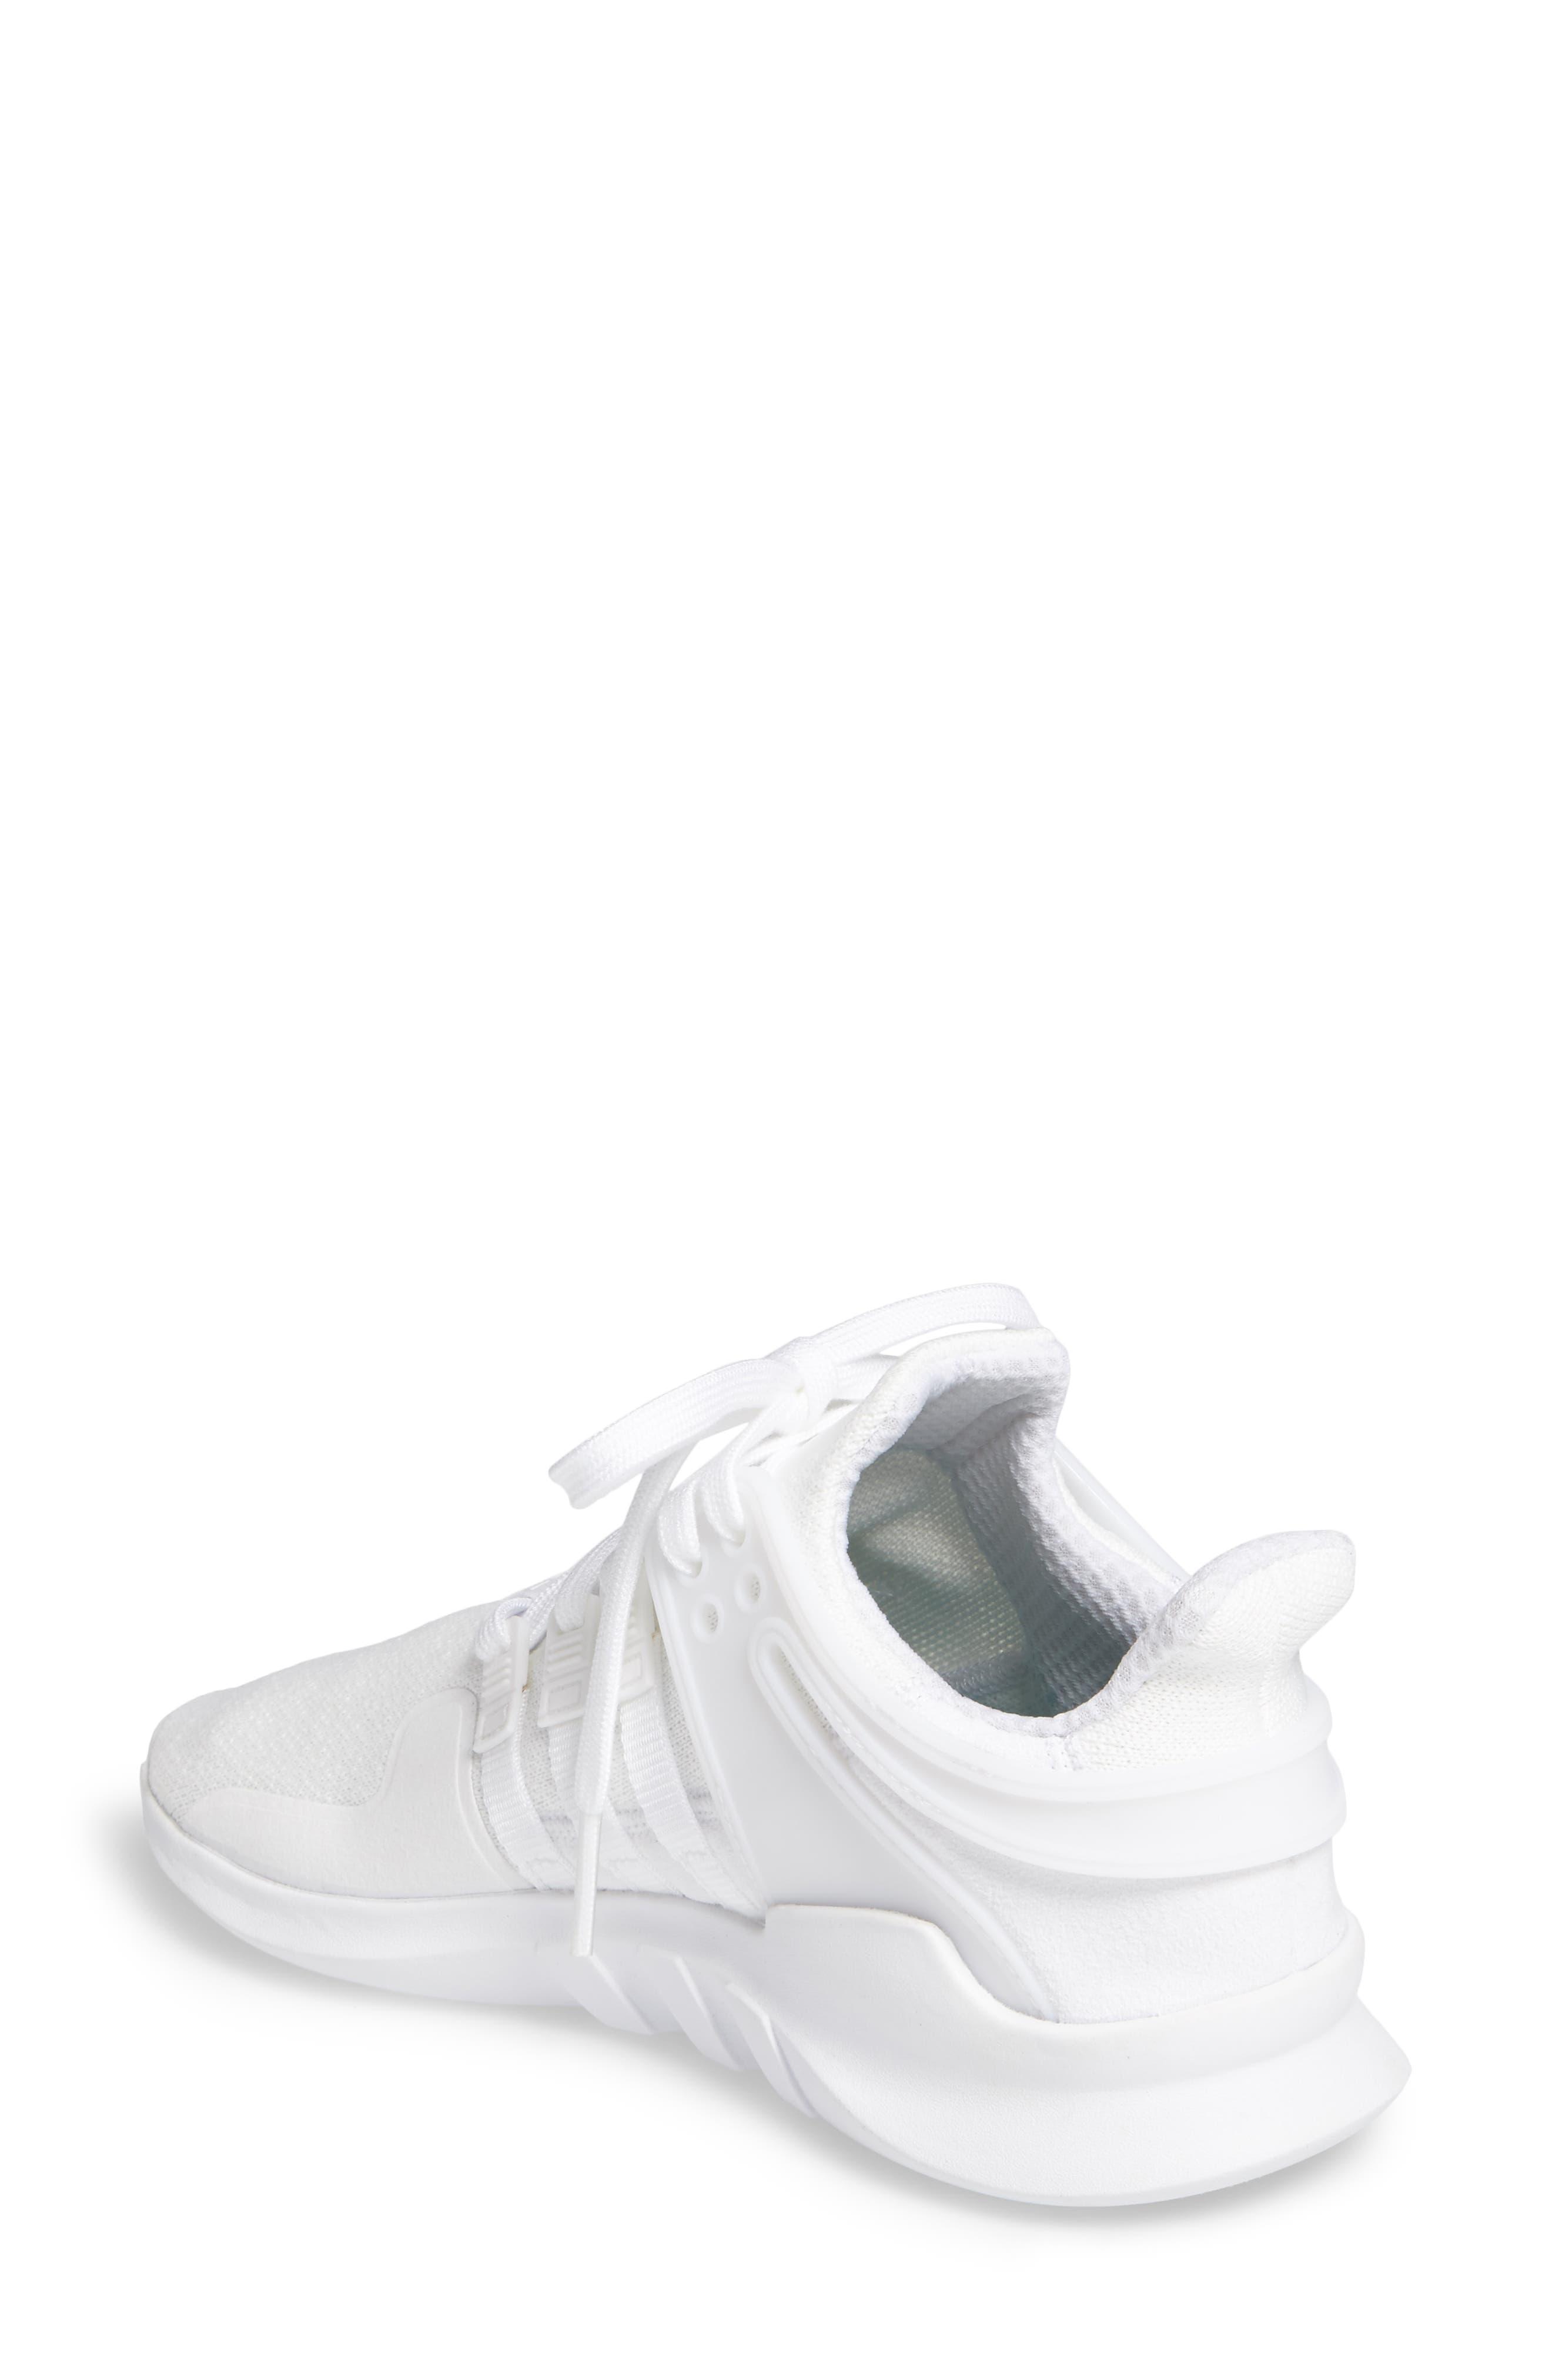 EQT Support Adv Sneaker,                             Alternate thumbnail 20, color,